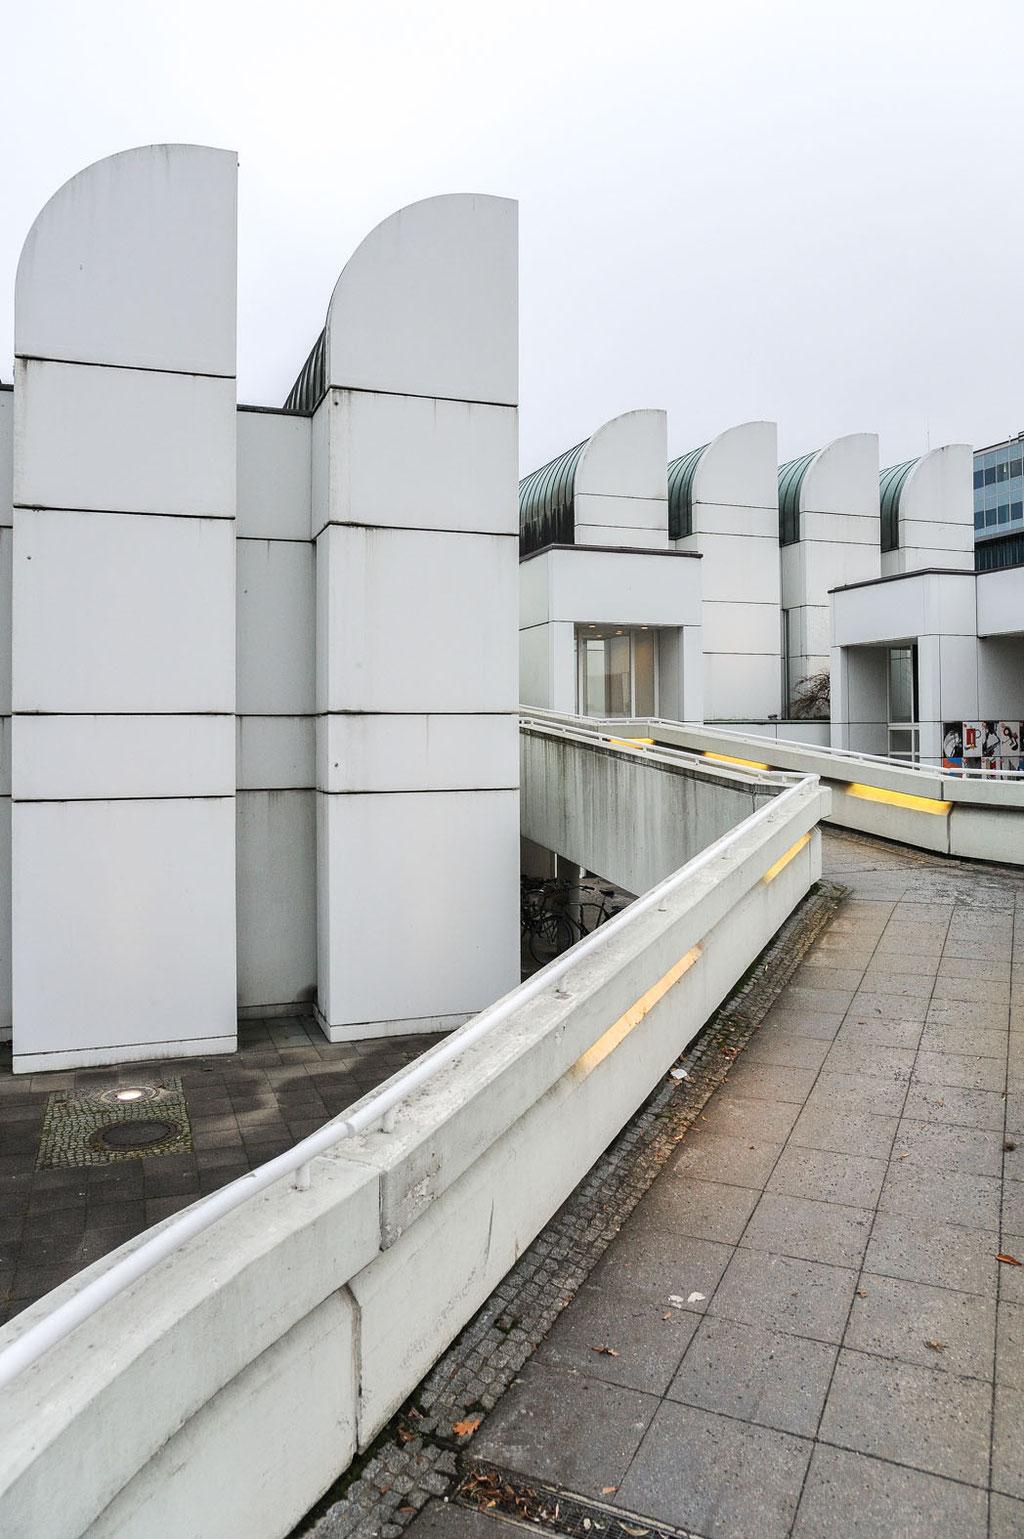 Bauhaus-Archiv (Alexander Cvijanovic, Walter Gropius), Berlin (D)